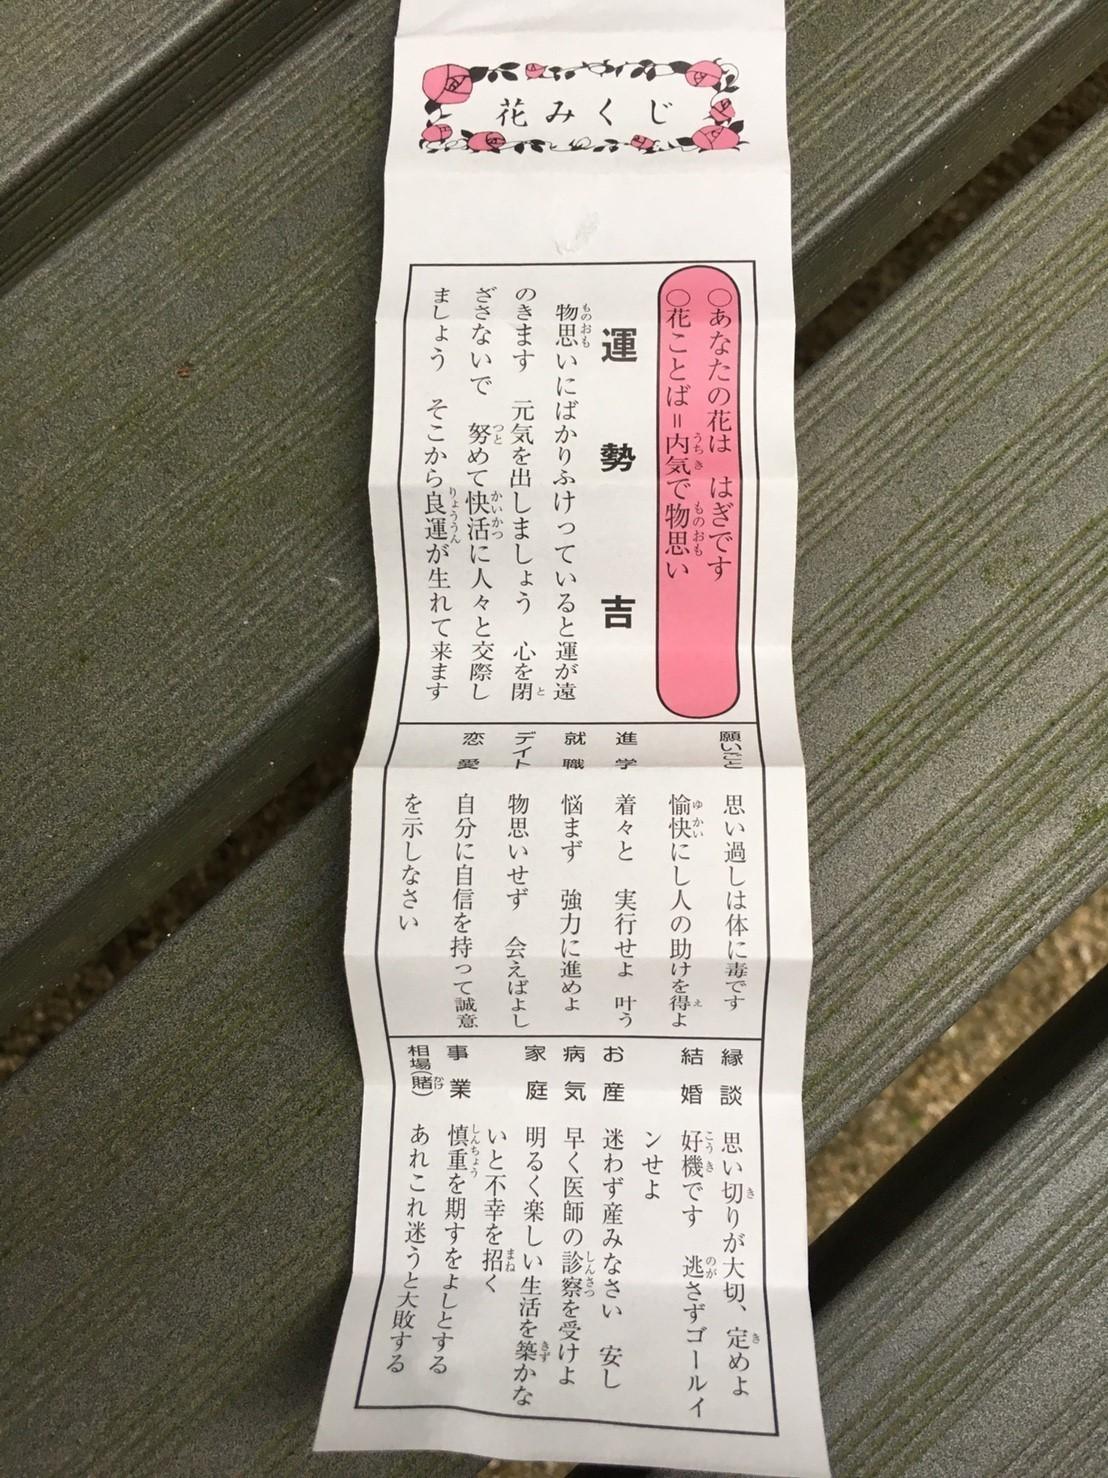 Pasciona   不動谷川流域滝めぐり_e0115904_03591089.jpg